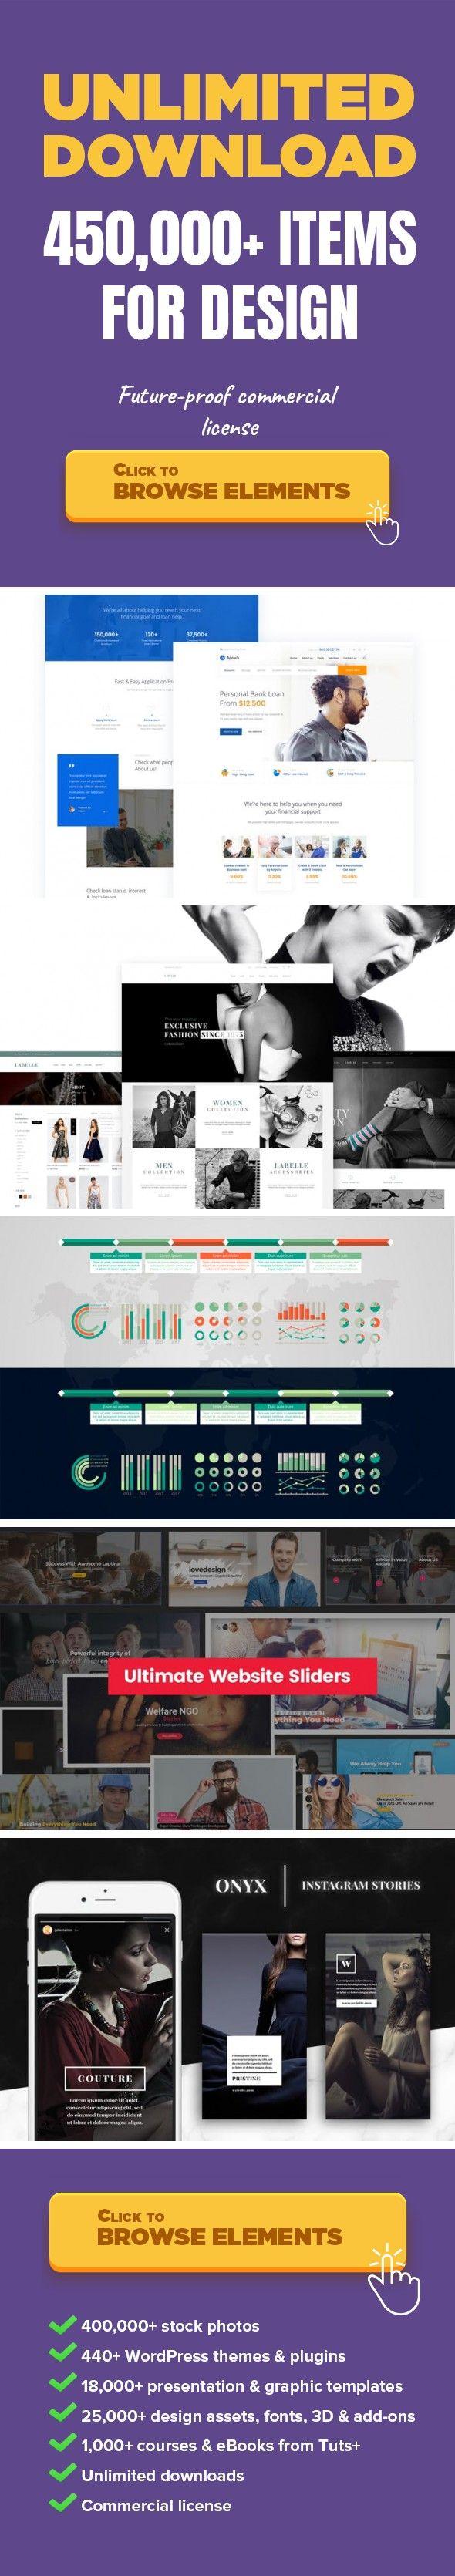 aproach - bank loan & business psd template graphic templates, Bank Loan Presentation Template, Presentation templates